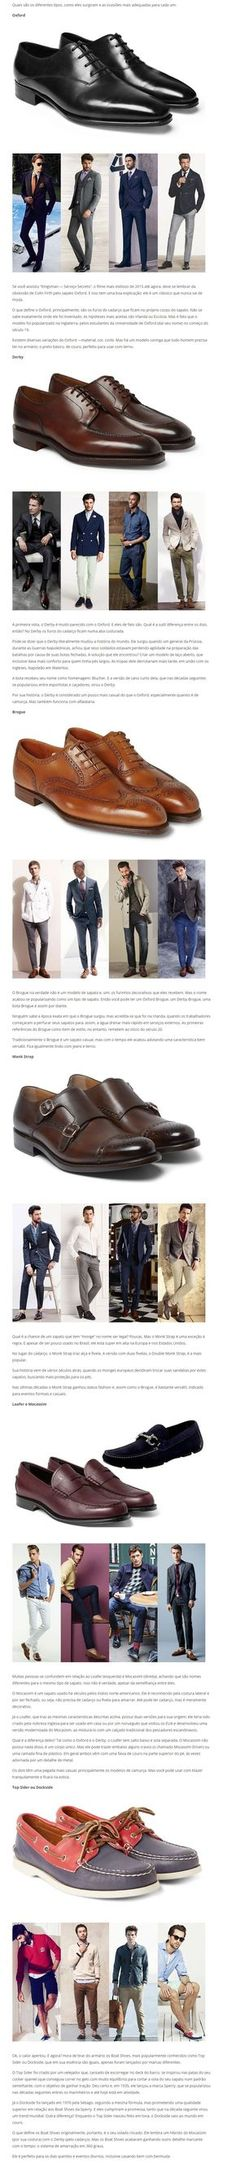 Sapatos masculinos - Guia de como usar